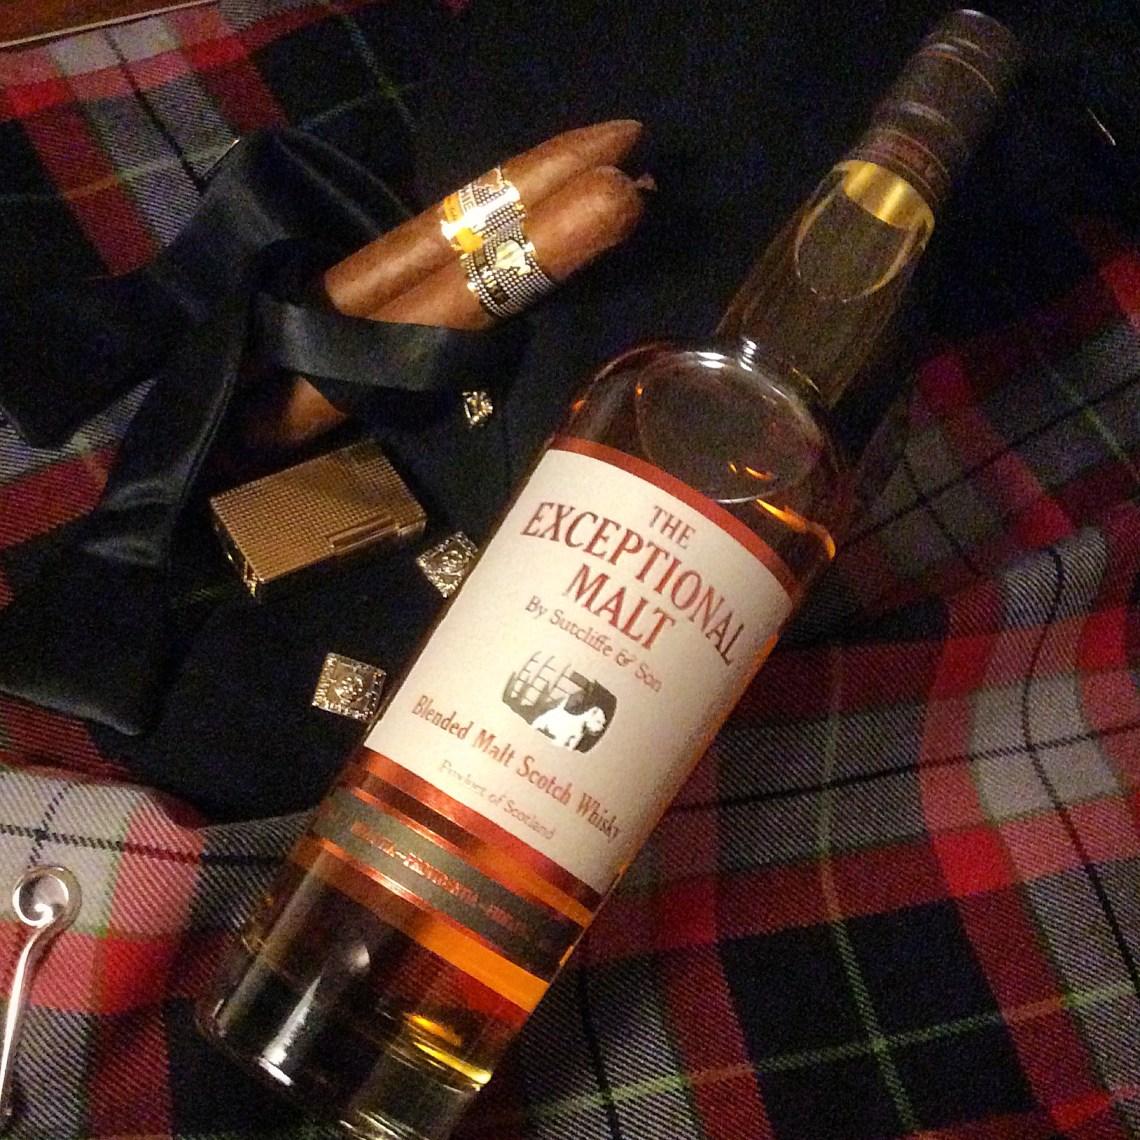 The Exceptional Malt - Blended Malt Scotch Whisky